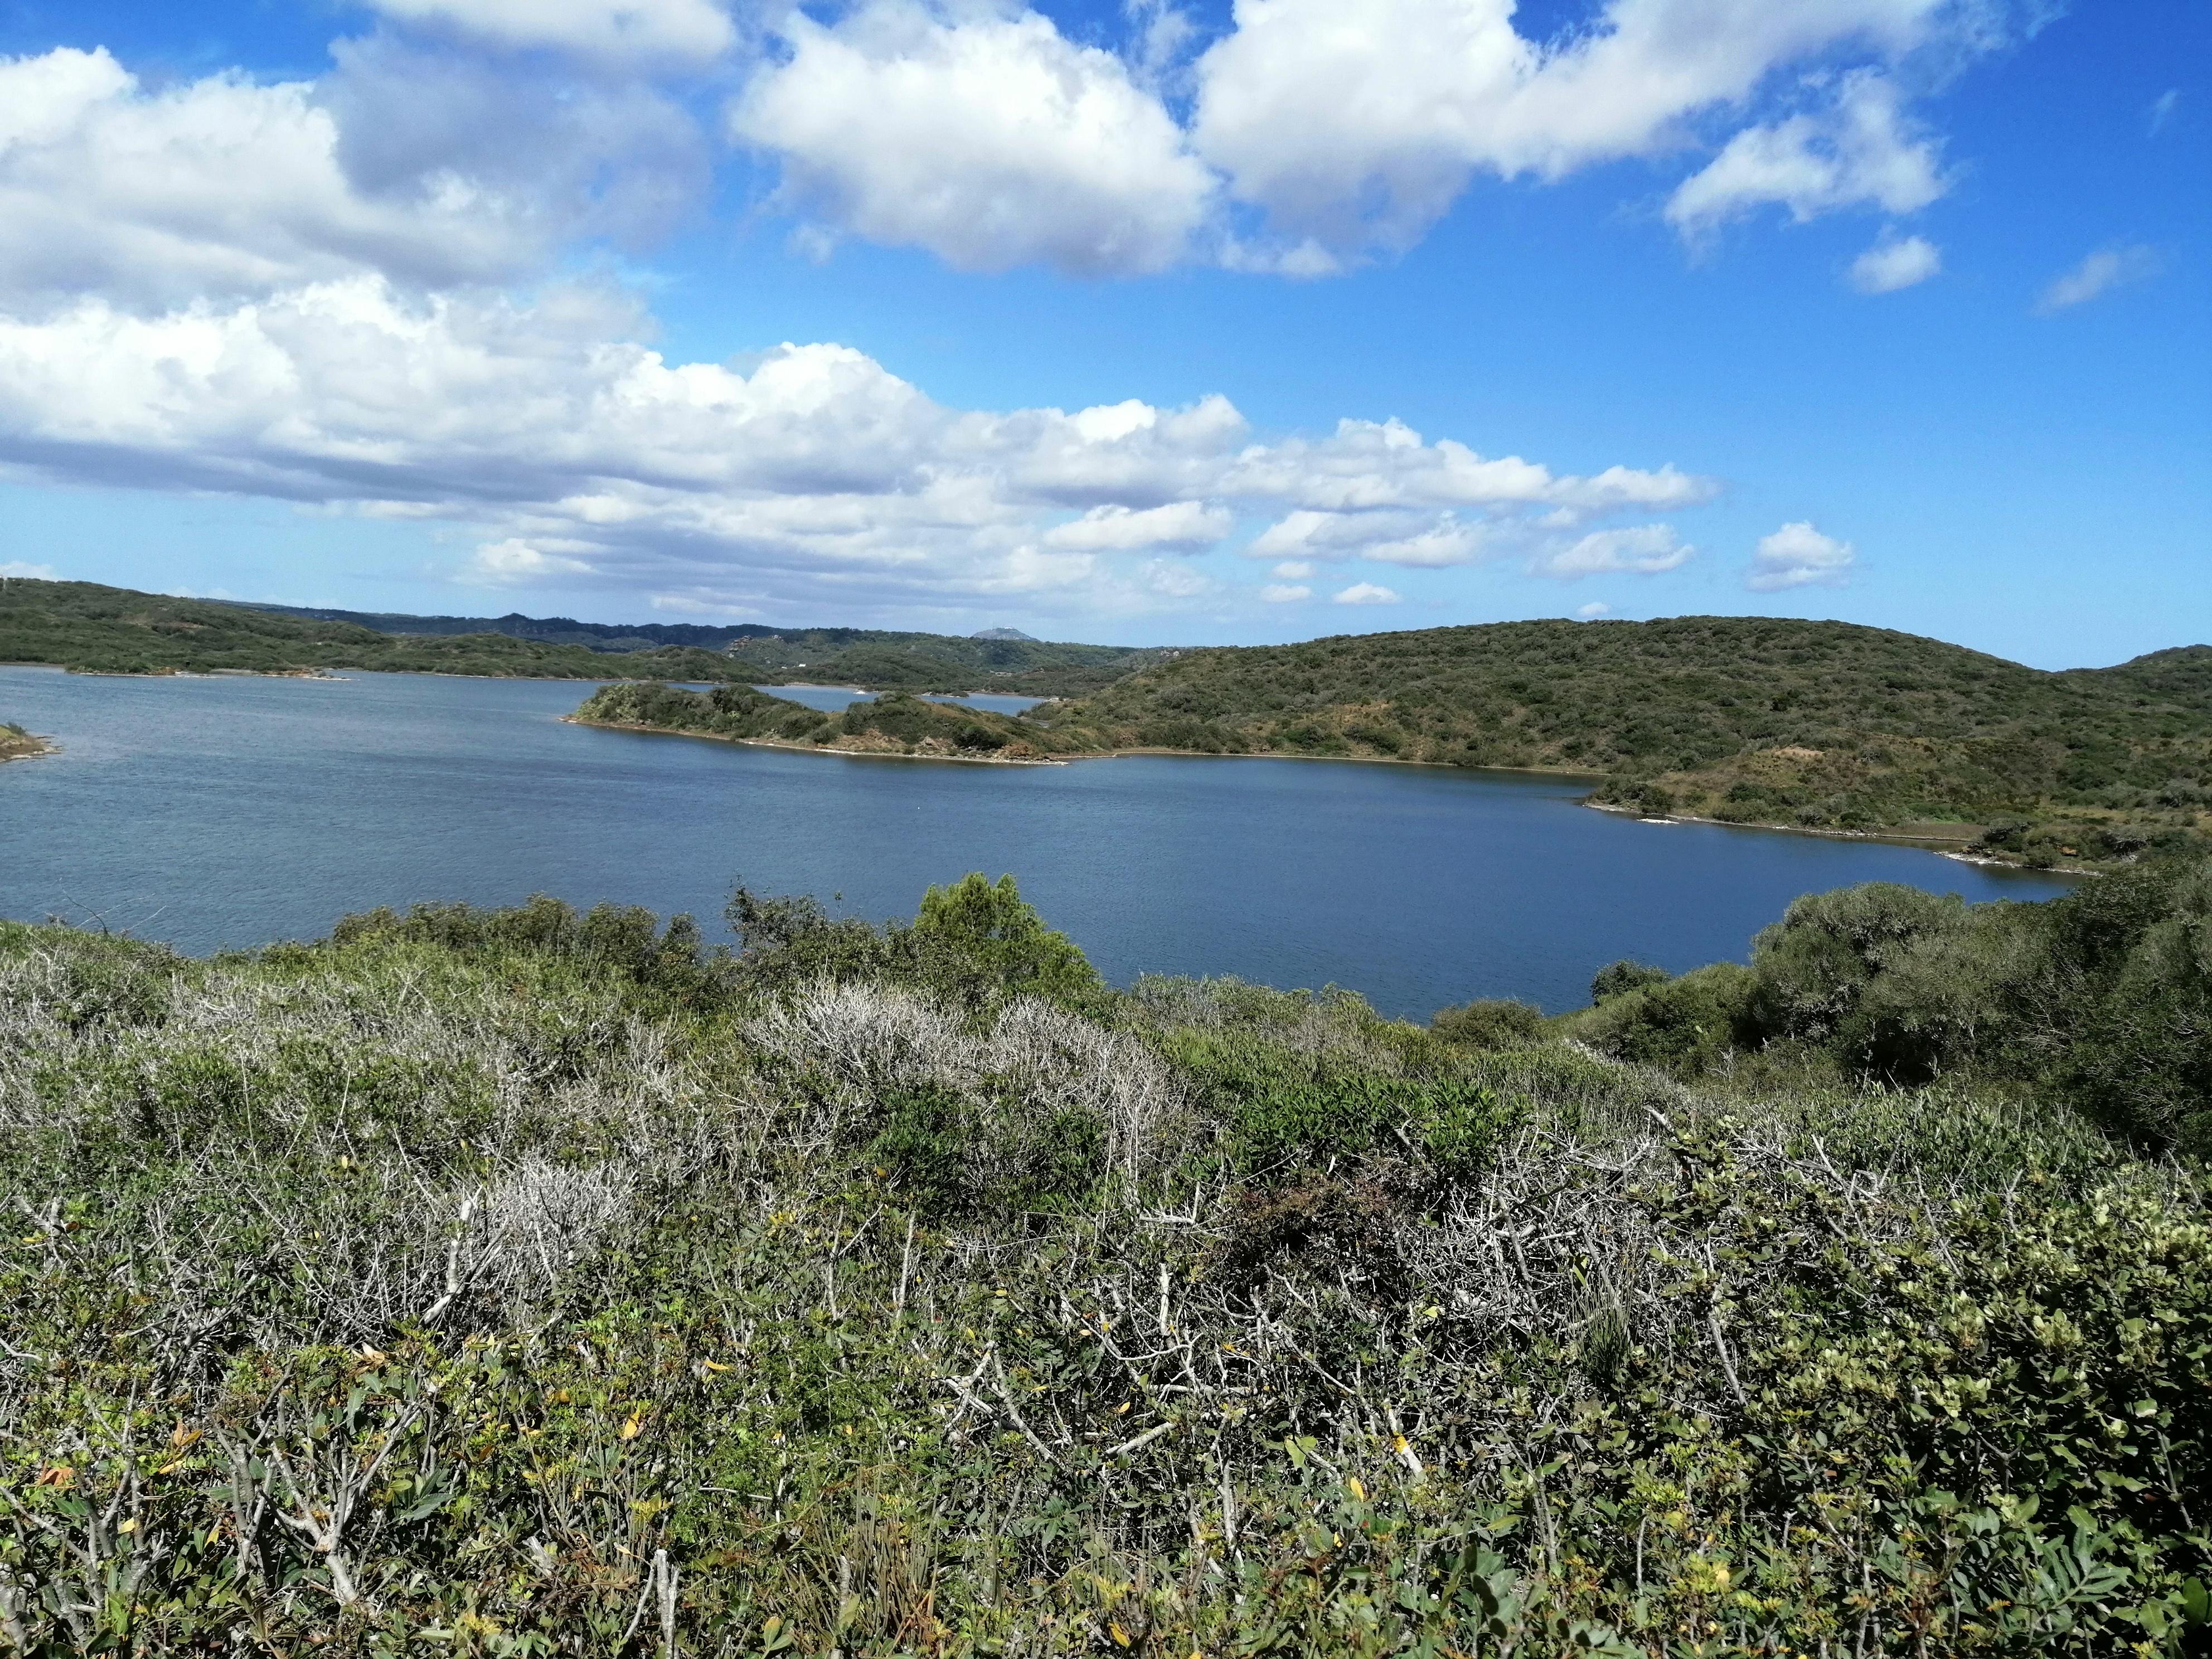 Parc naturel de s'Albufera d'Es Grau